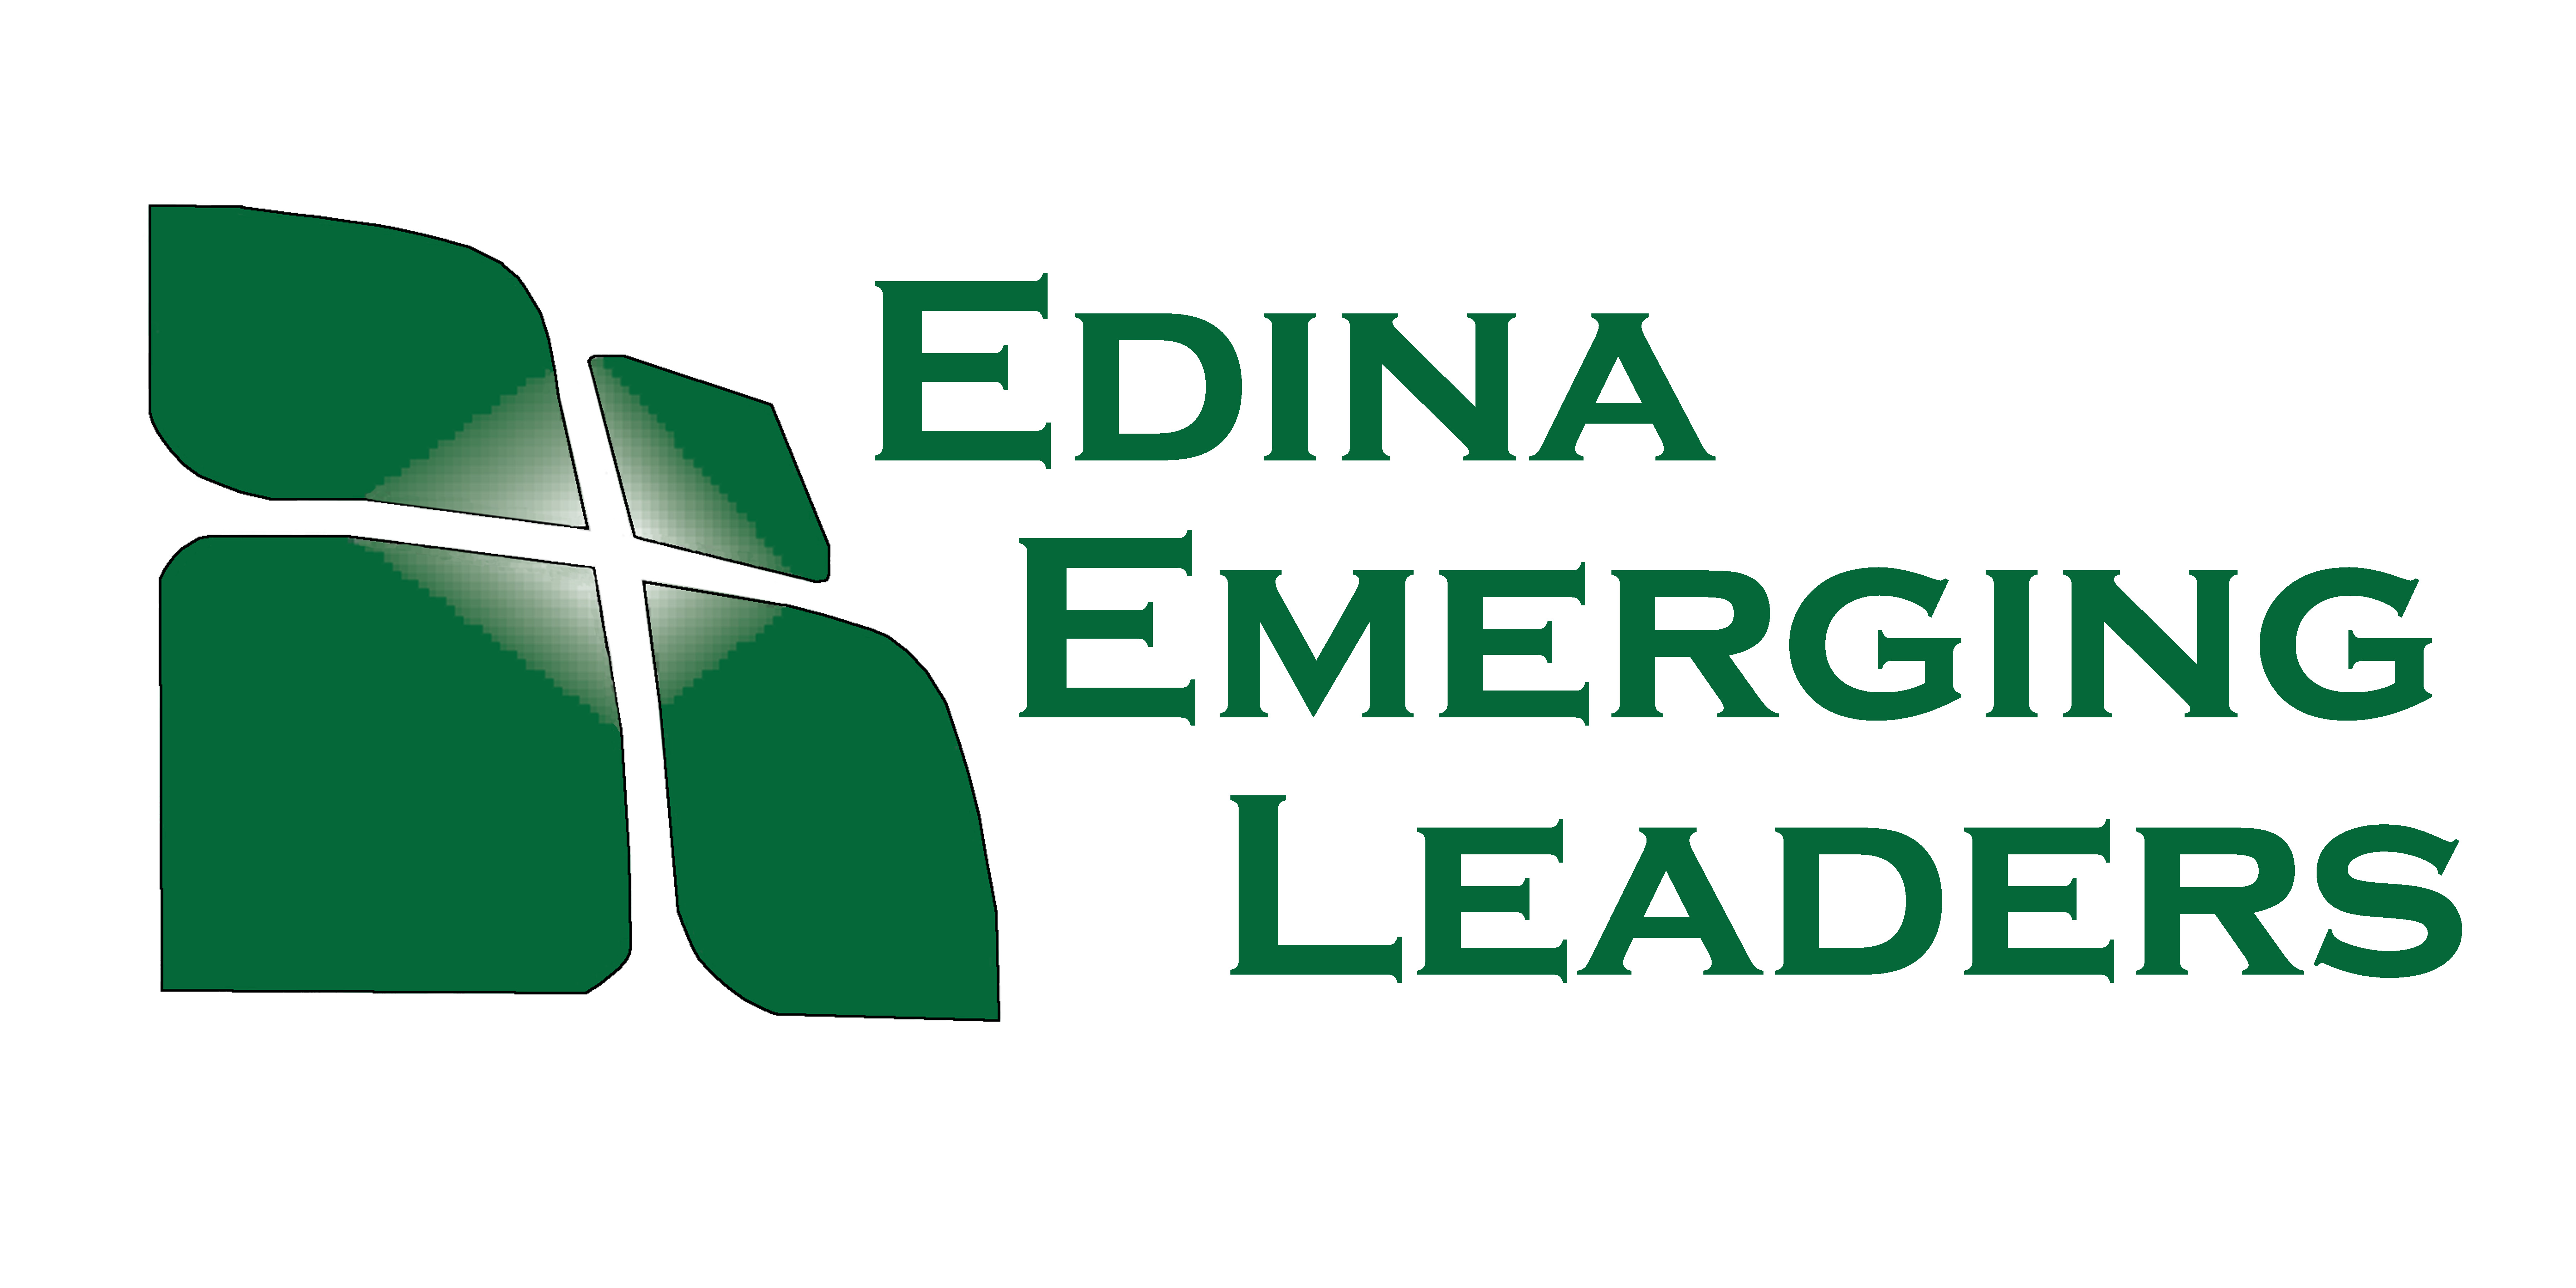 Emerging leaders edina chamber of commerce mn